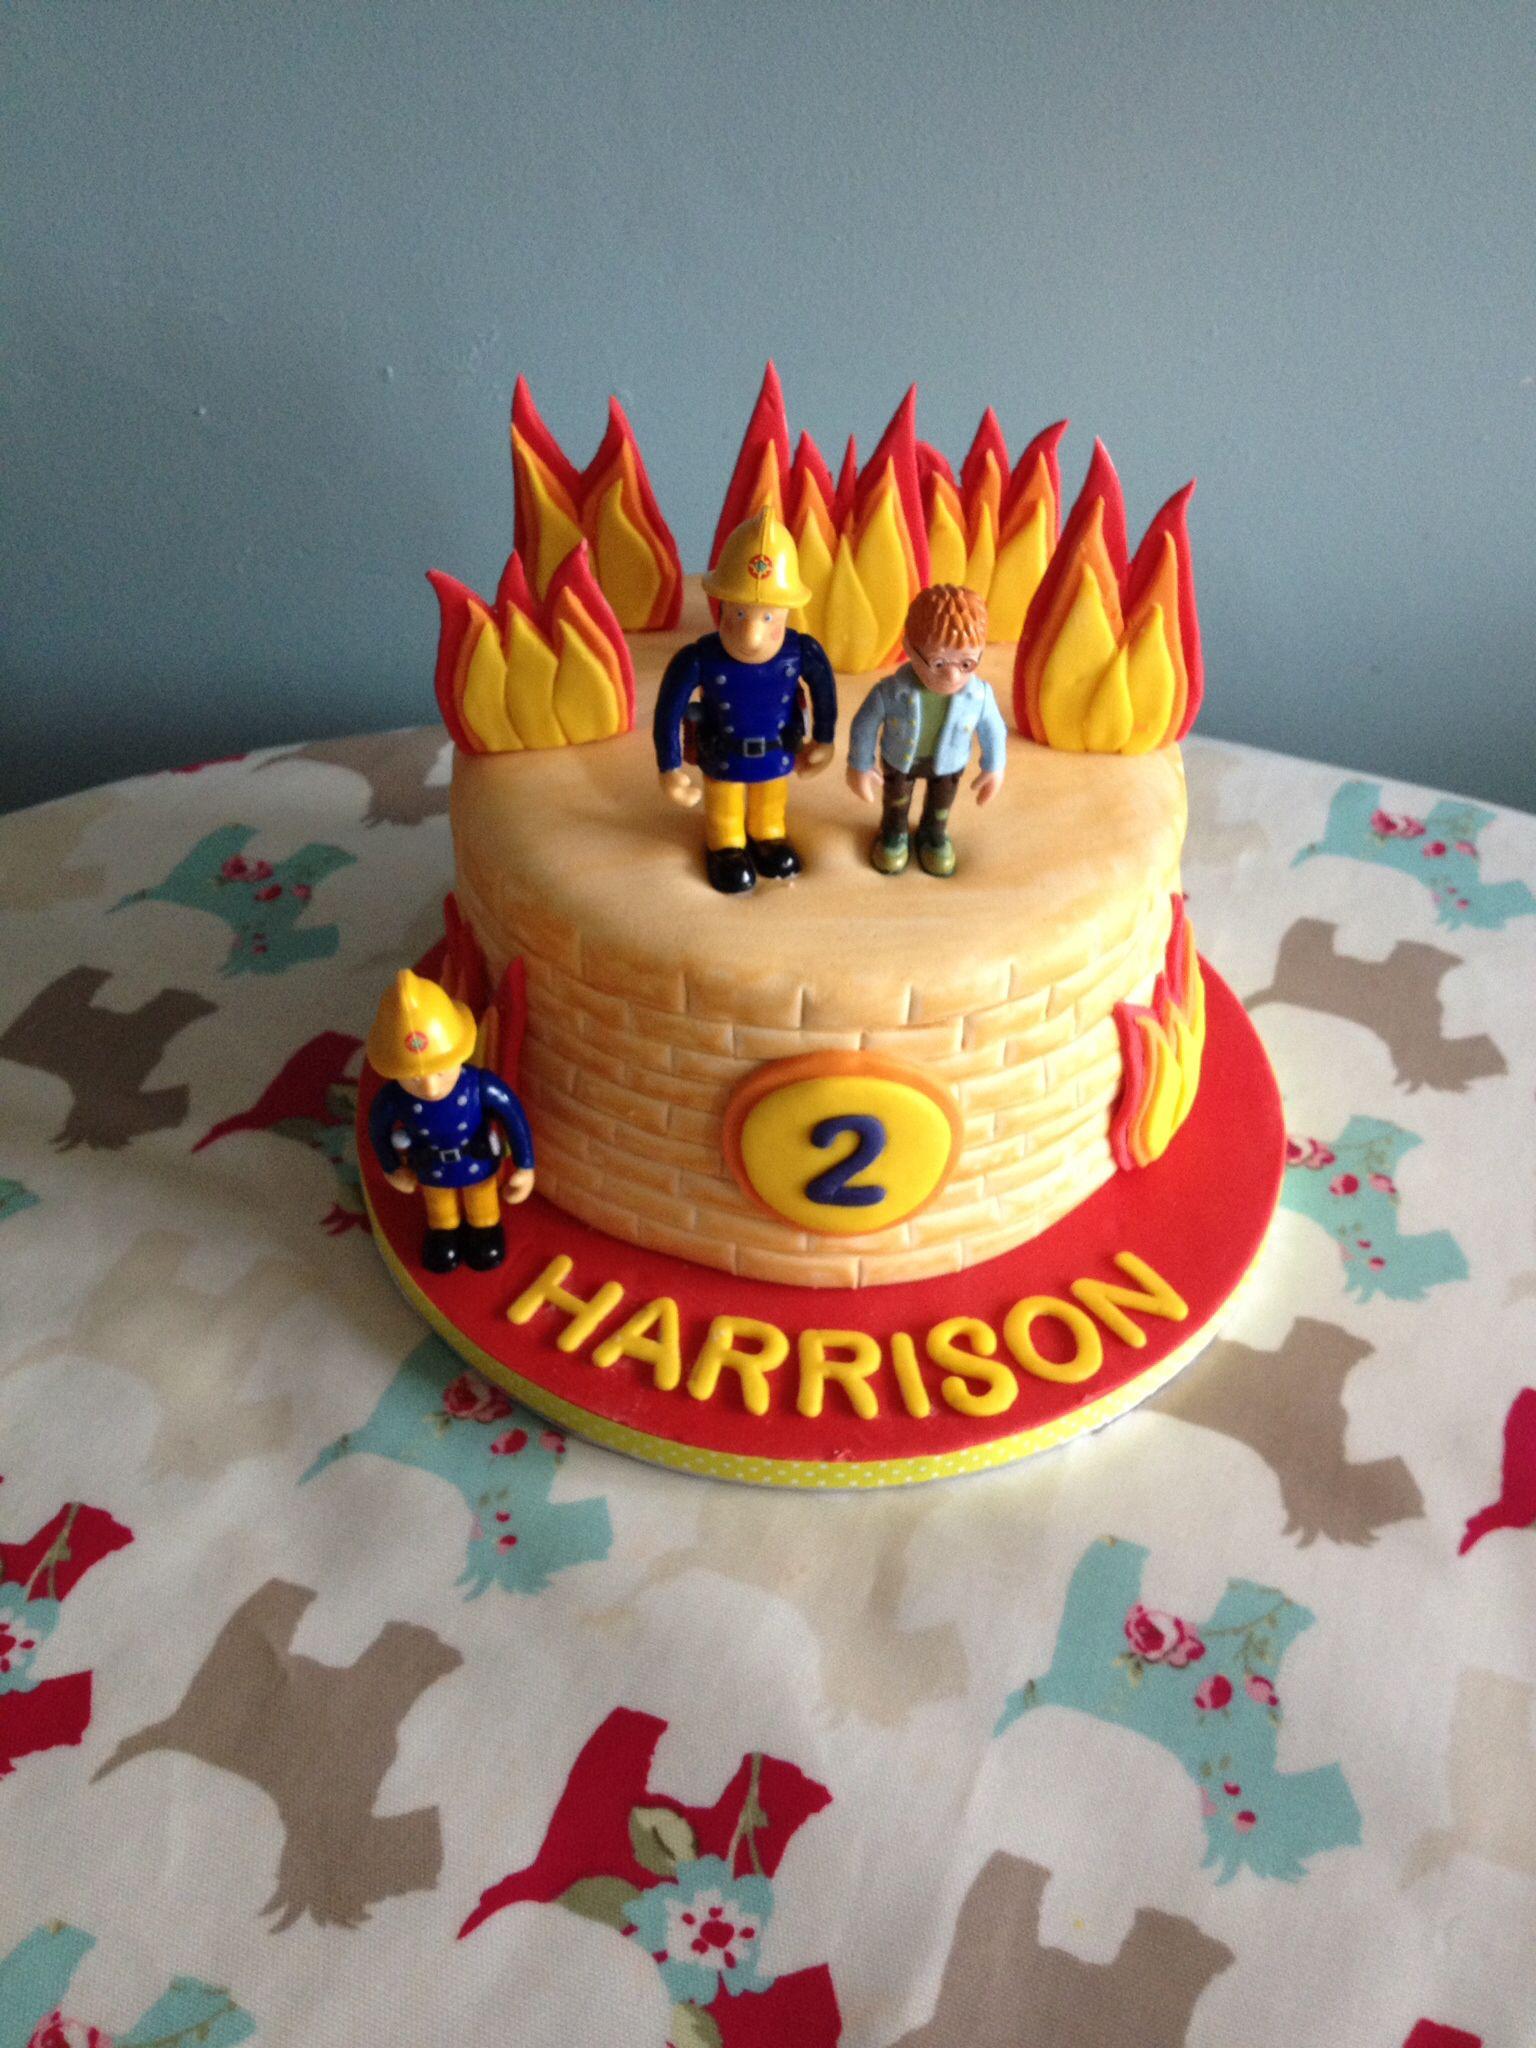 fireman sam cake fireman birthday party bolos. Black Bedroom Furniture Sets. Home Design Ideas